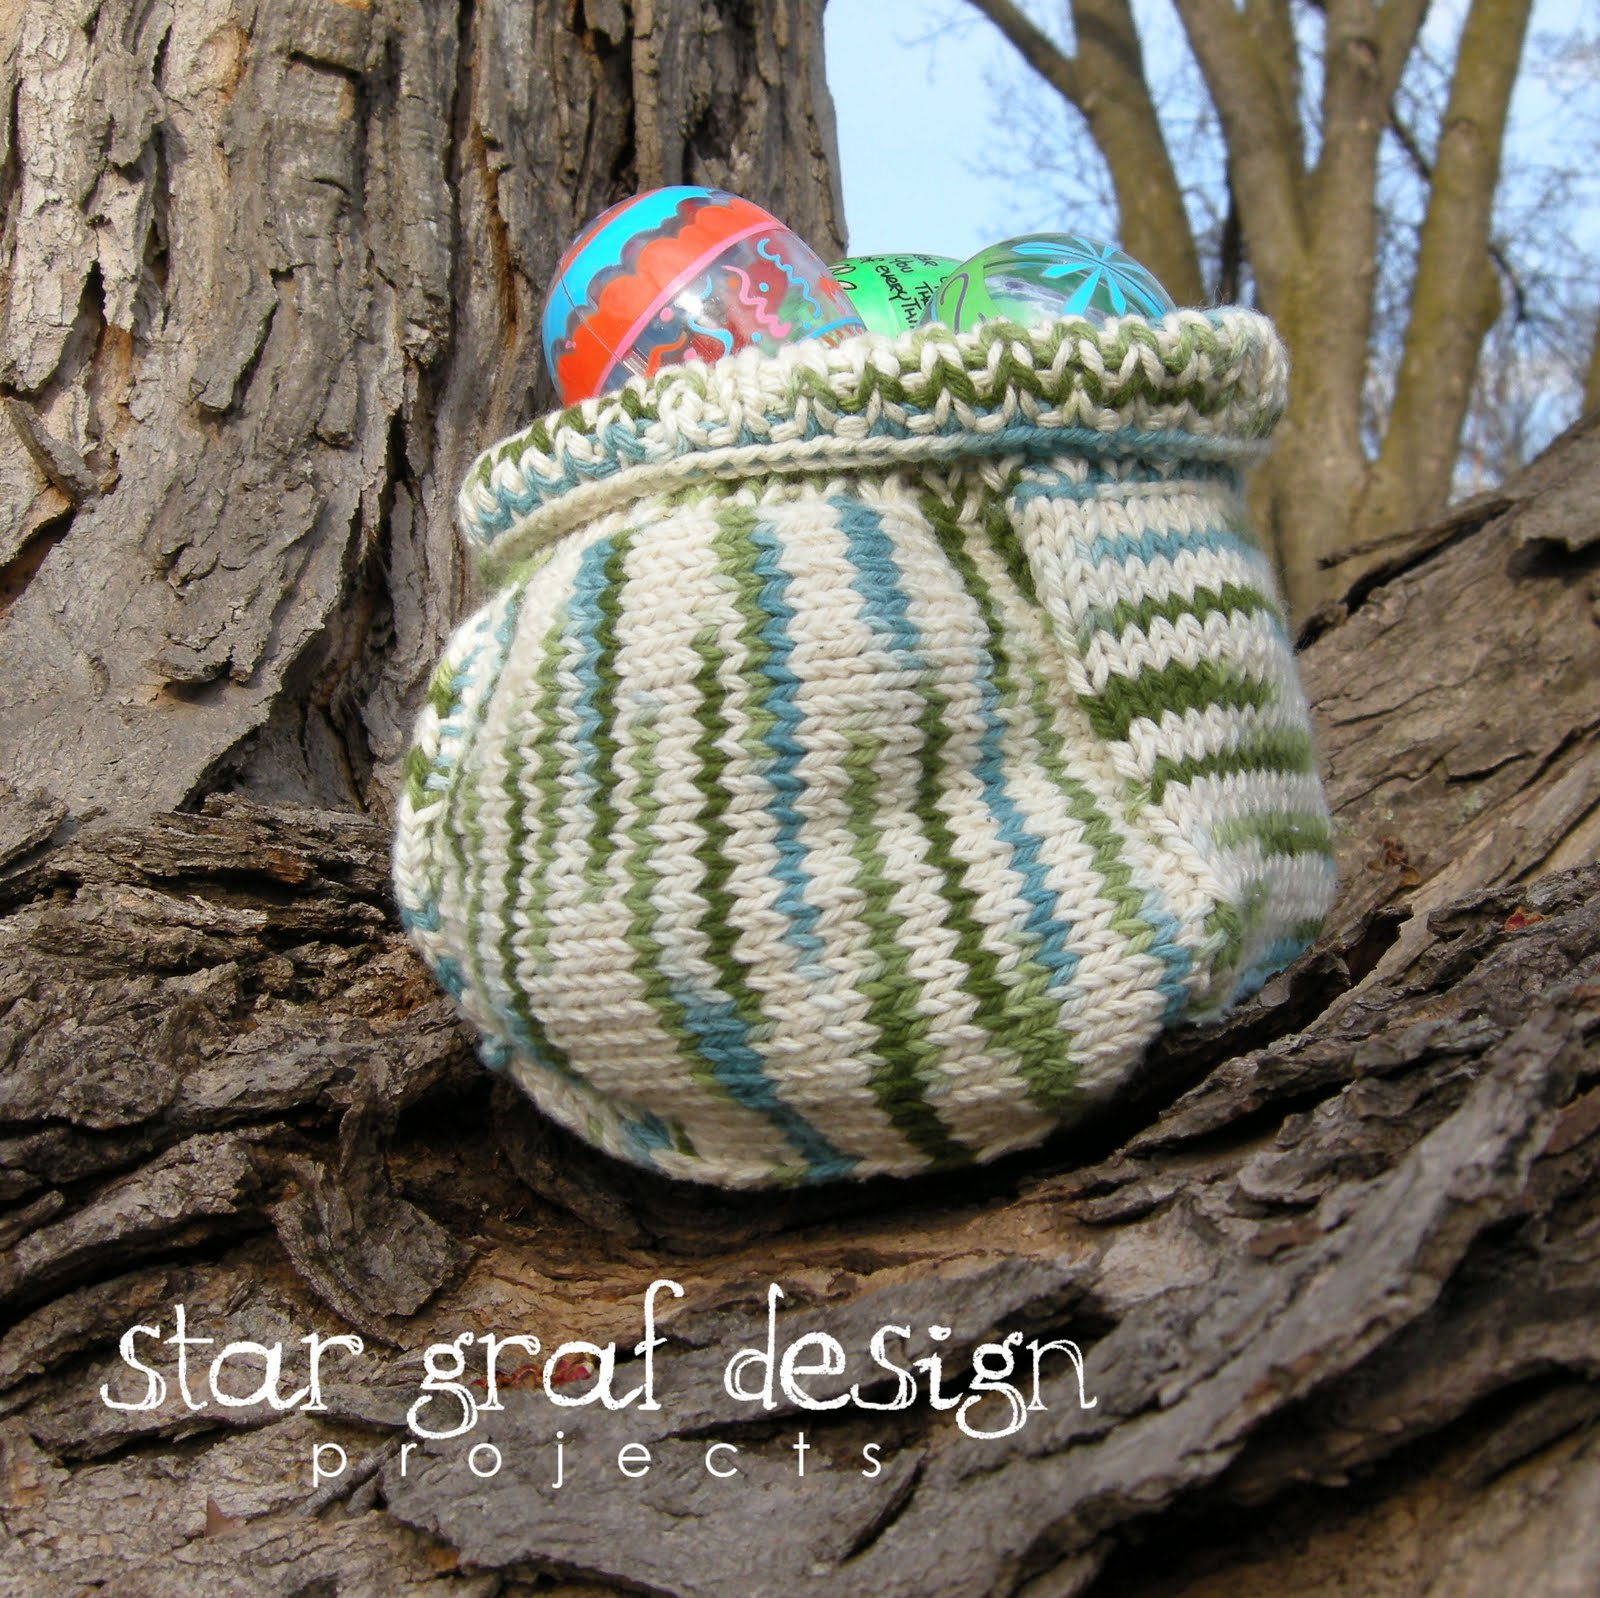 Handmade easter baskets - Custom made easter baskets ...